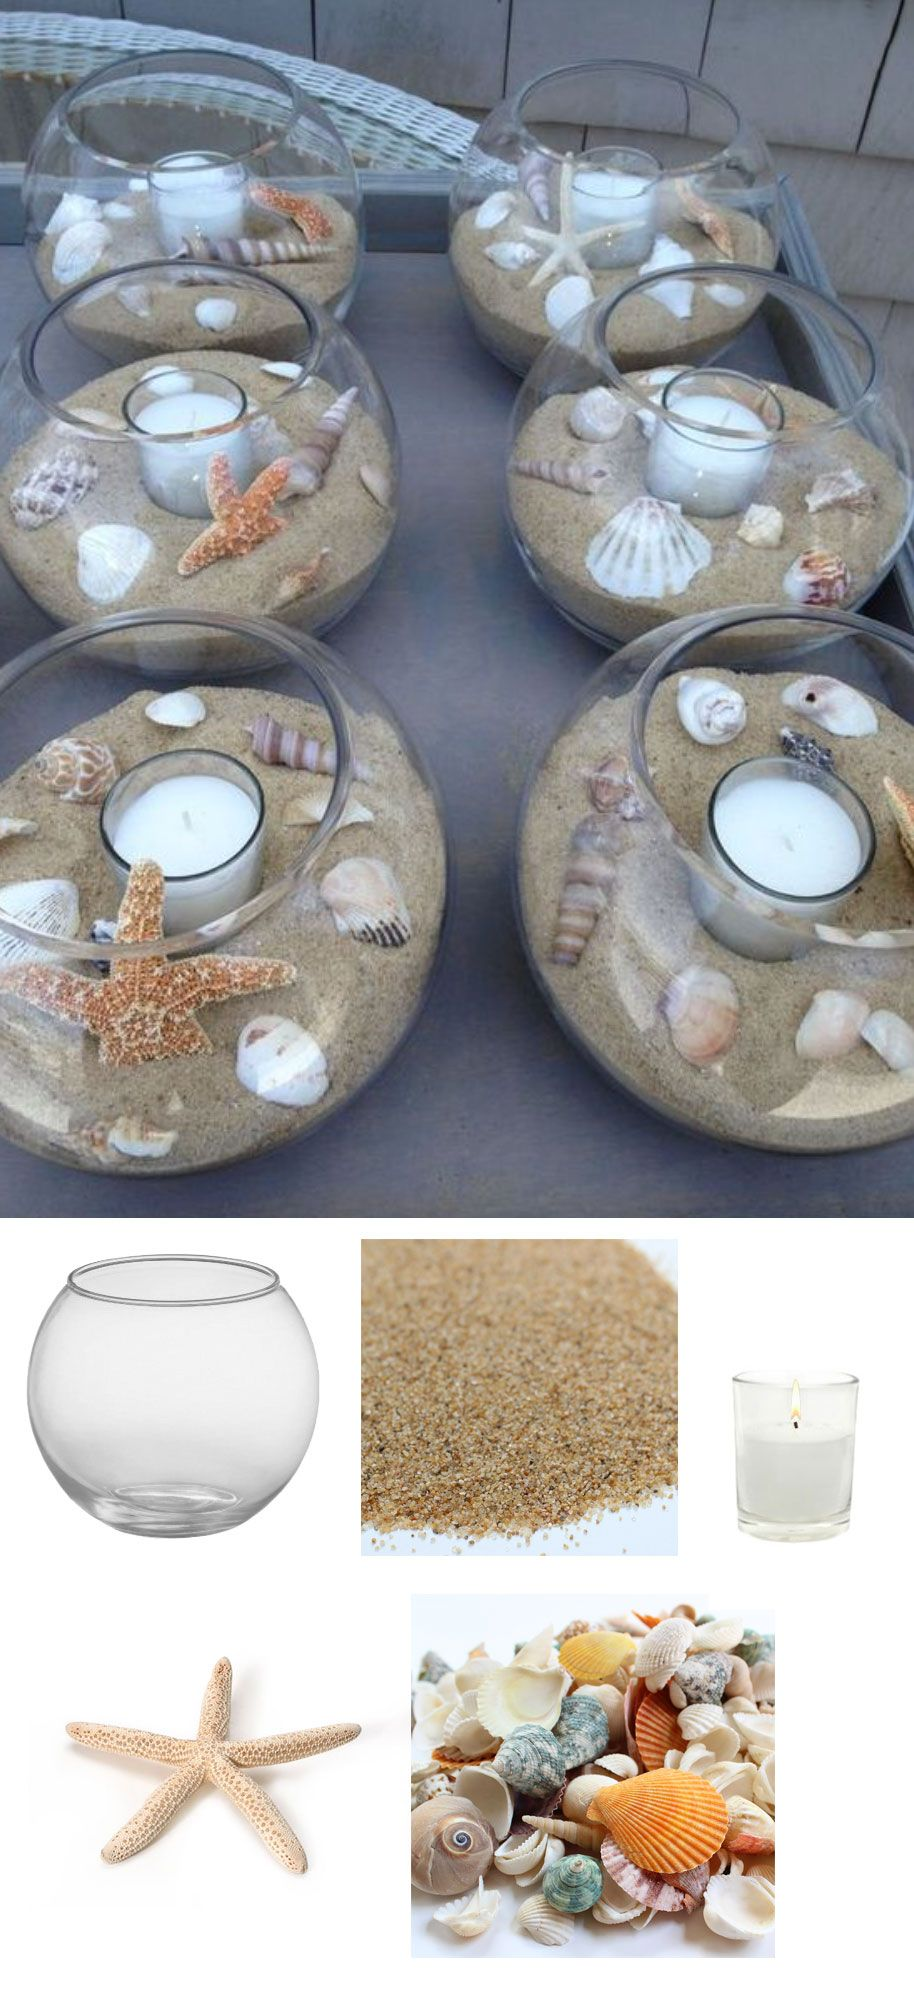 Easy Diy Beach Centerpiece Recreate This Centerpiece With Glass